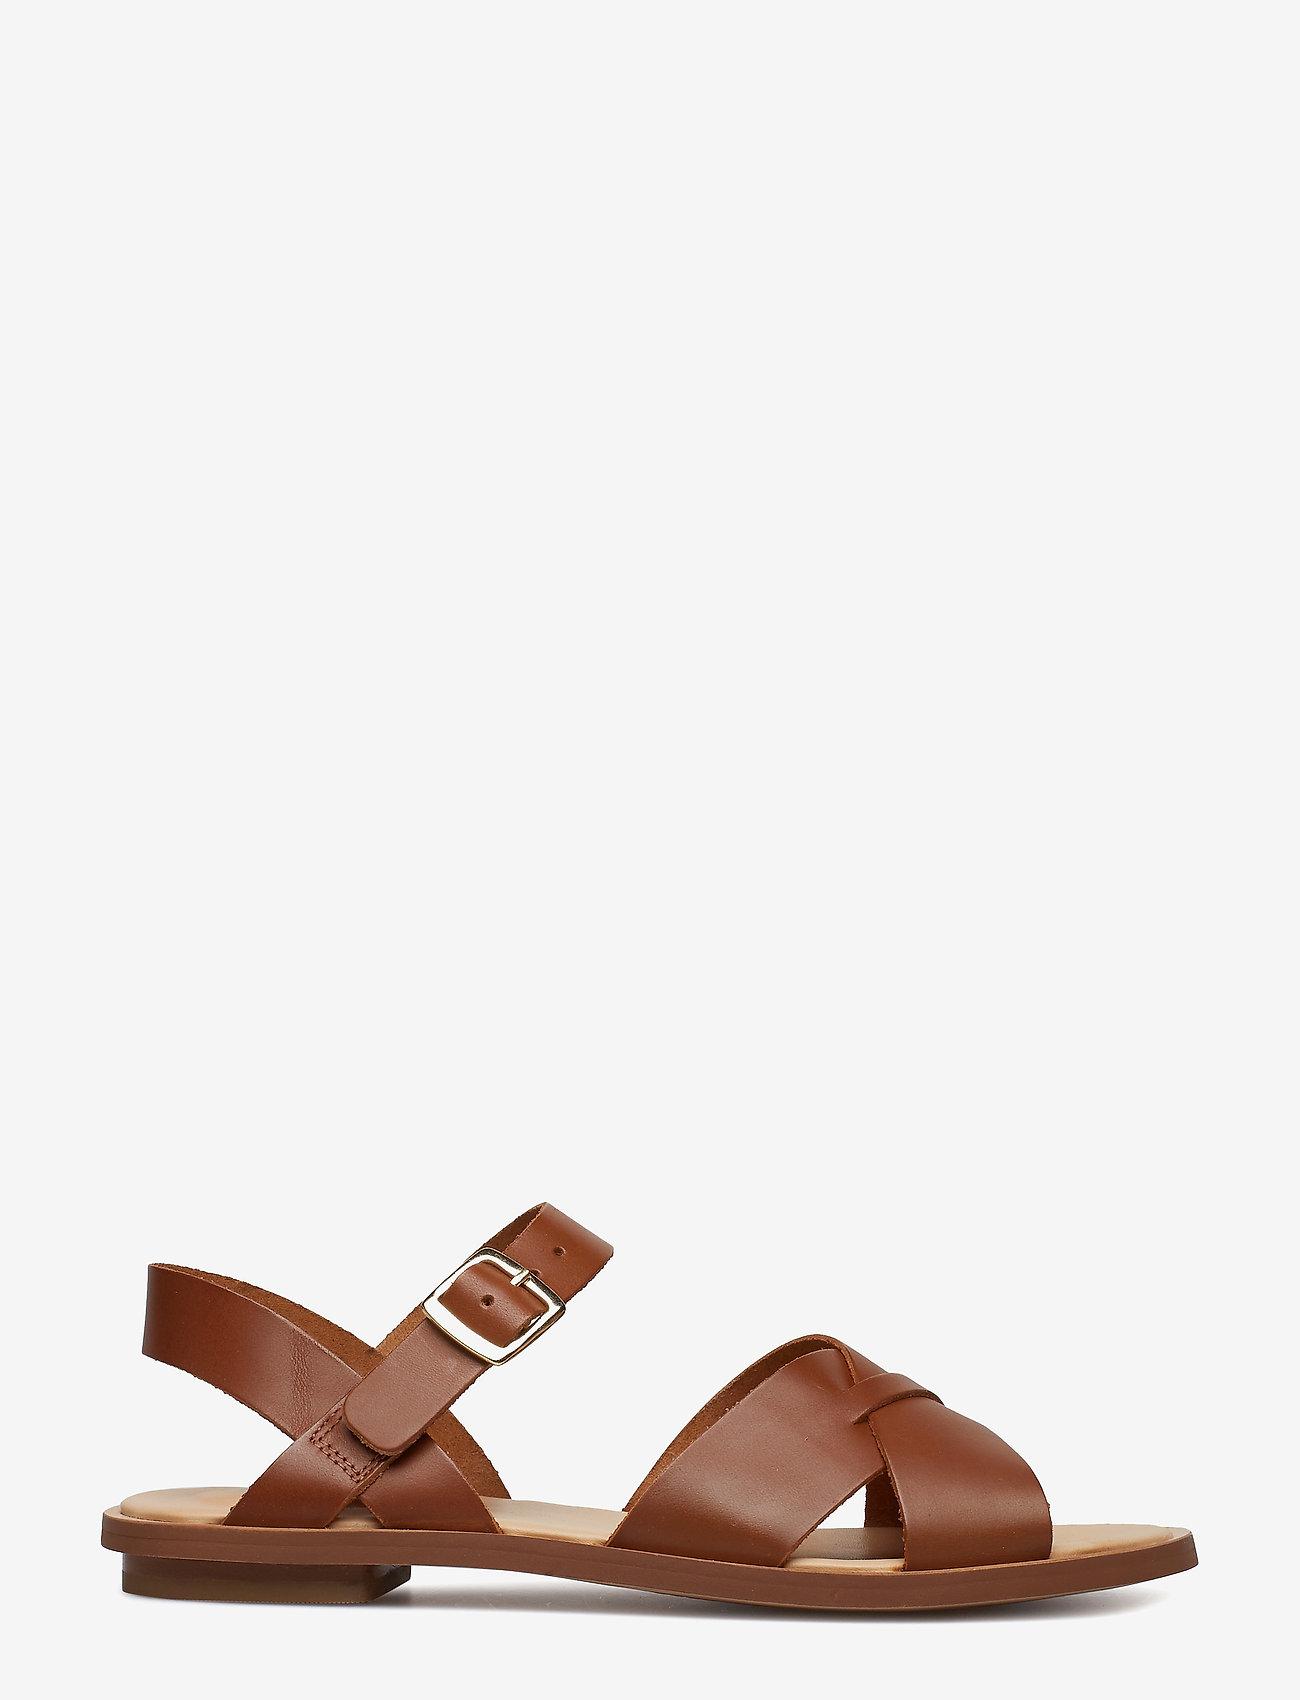 Clarks Willow Gild - Sandalen LIGHT TAN LEA - Schuhe Billige